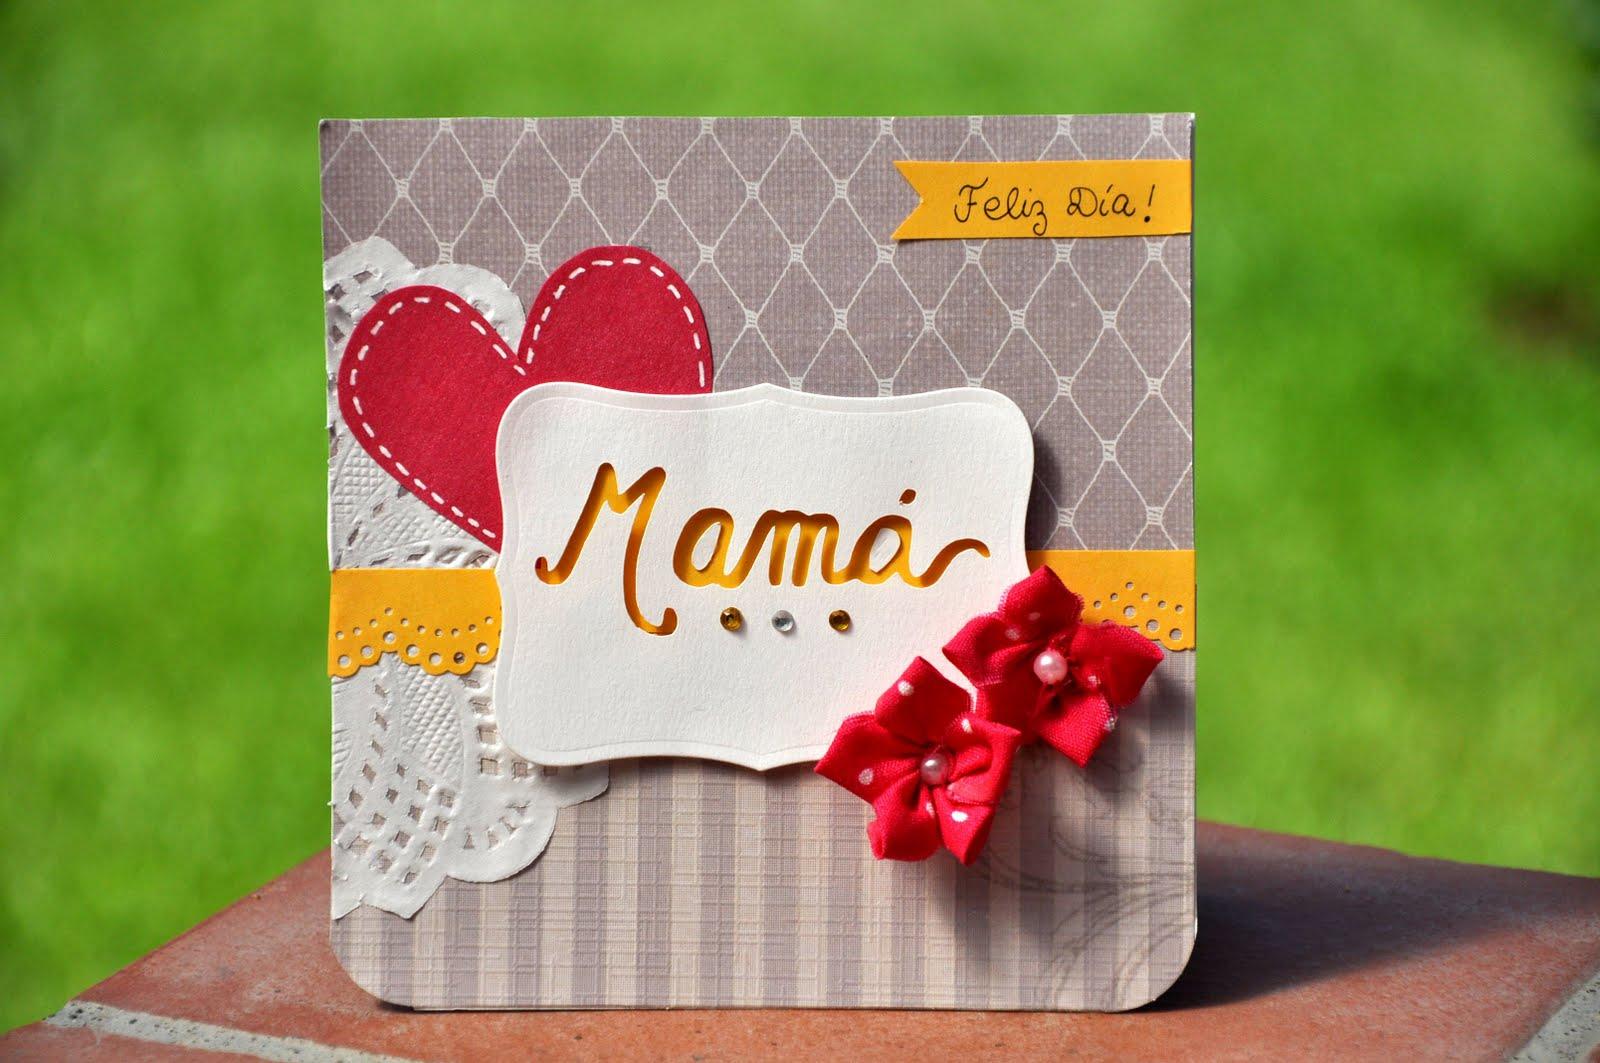 Feliz d a de la madre agus yornet blog - Tipos de papel manualidades ...